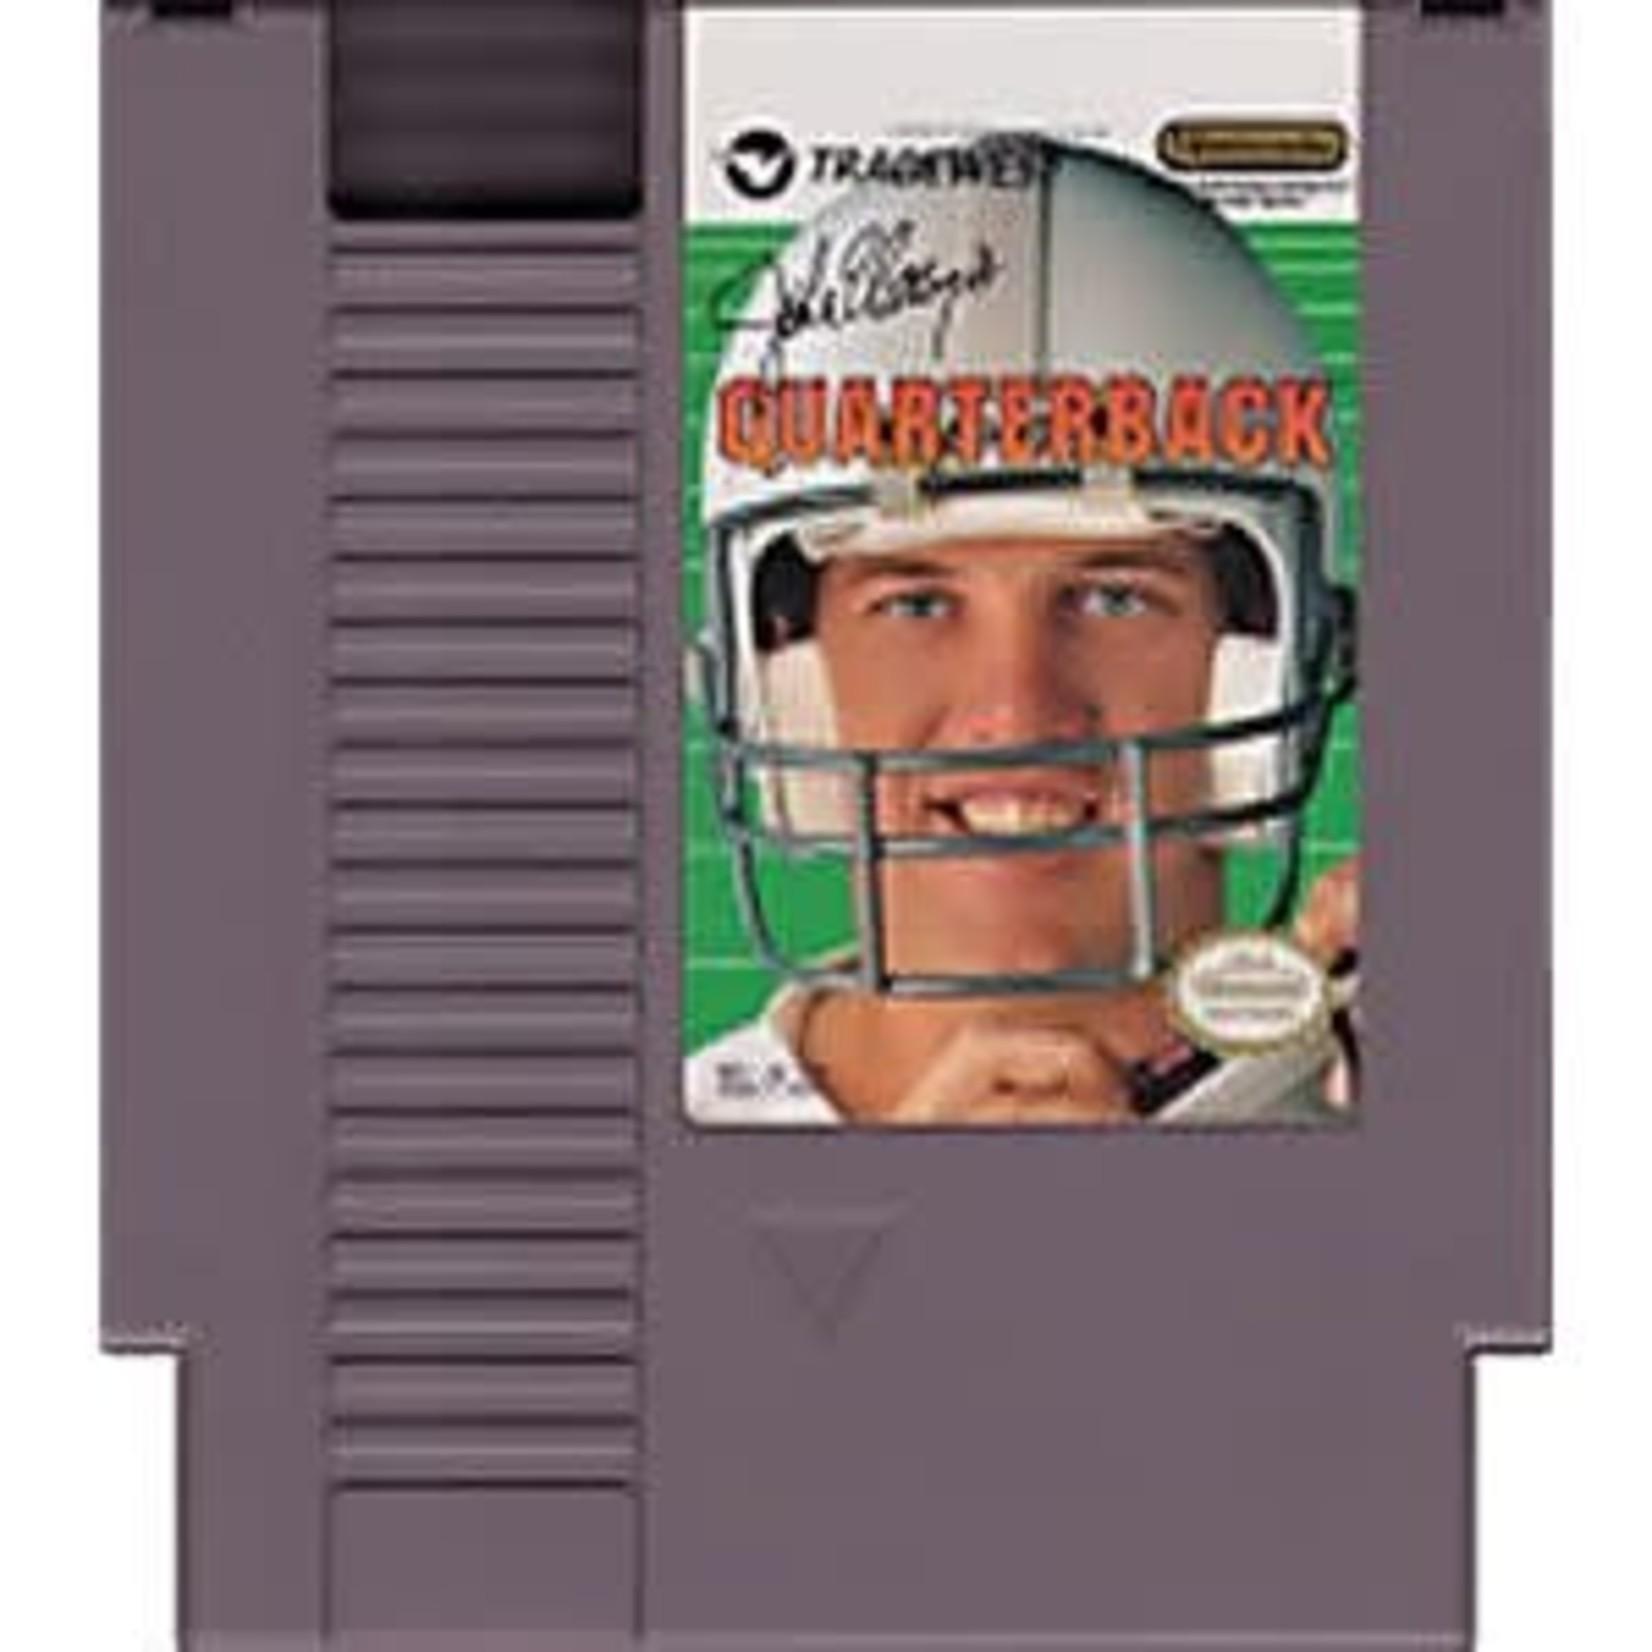 John Elway's Quarterback (NES)